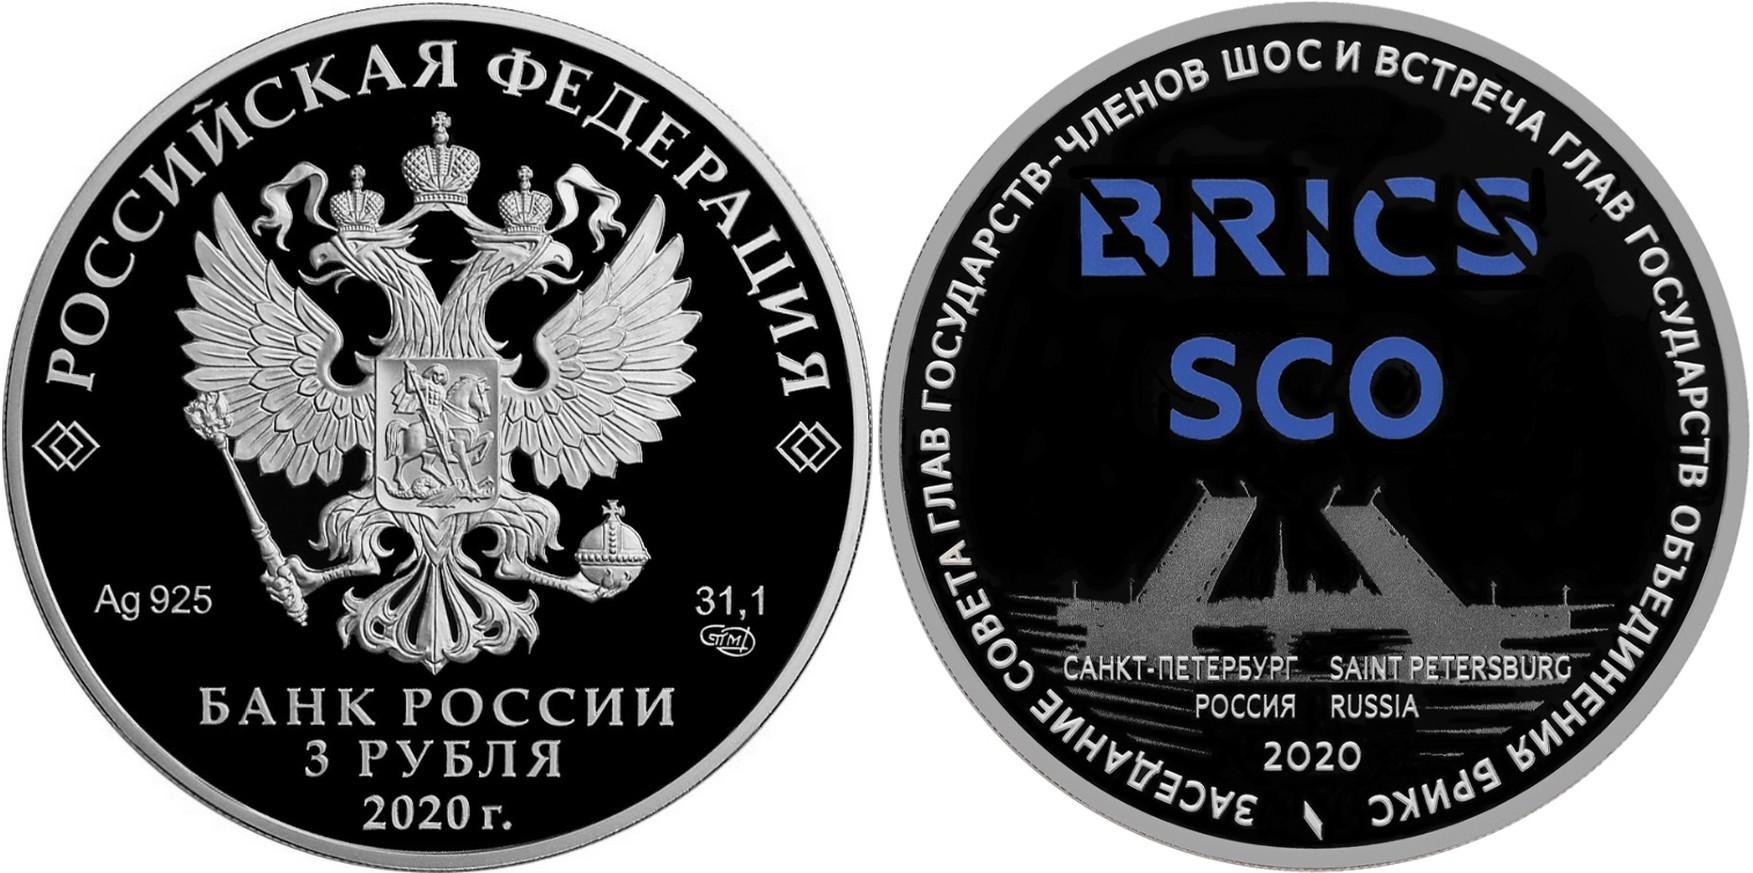 russie-2020-sommets-brics-et-sco